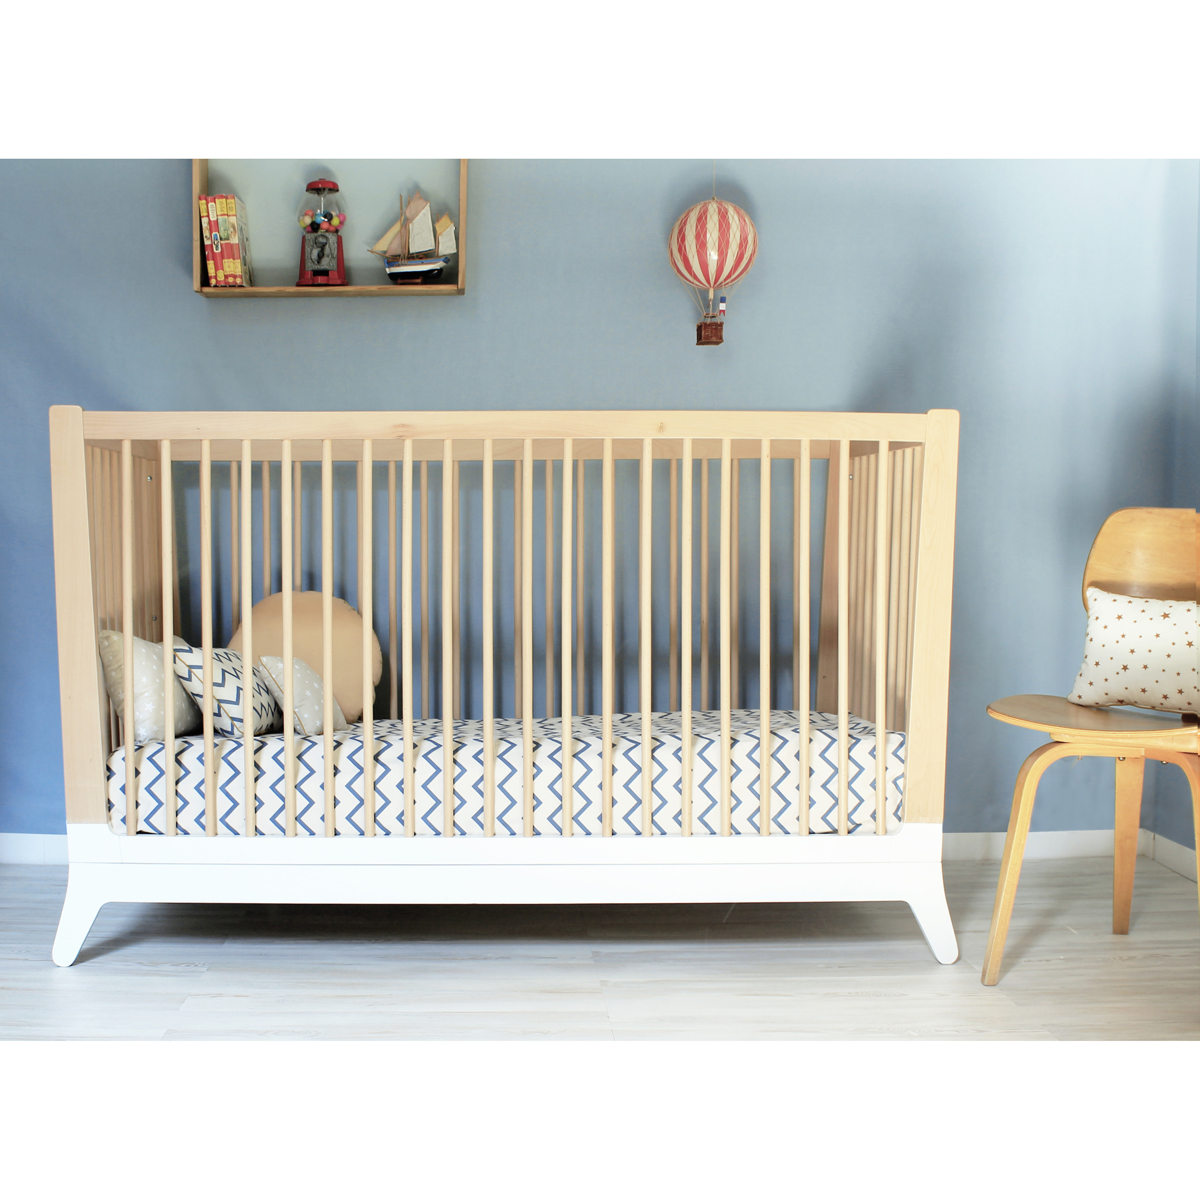 stunning httplombards netgrande chambre bebe gallery. Black Bedroom Furniture Sets. Home Design Ideas